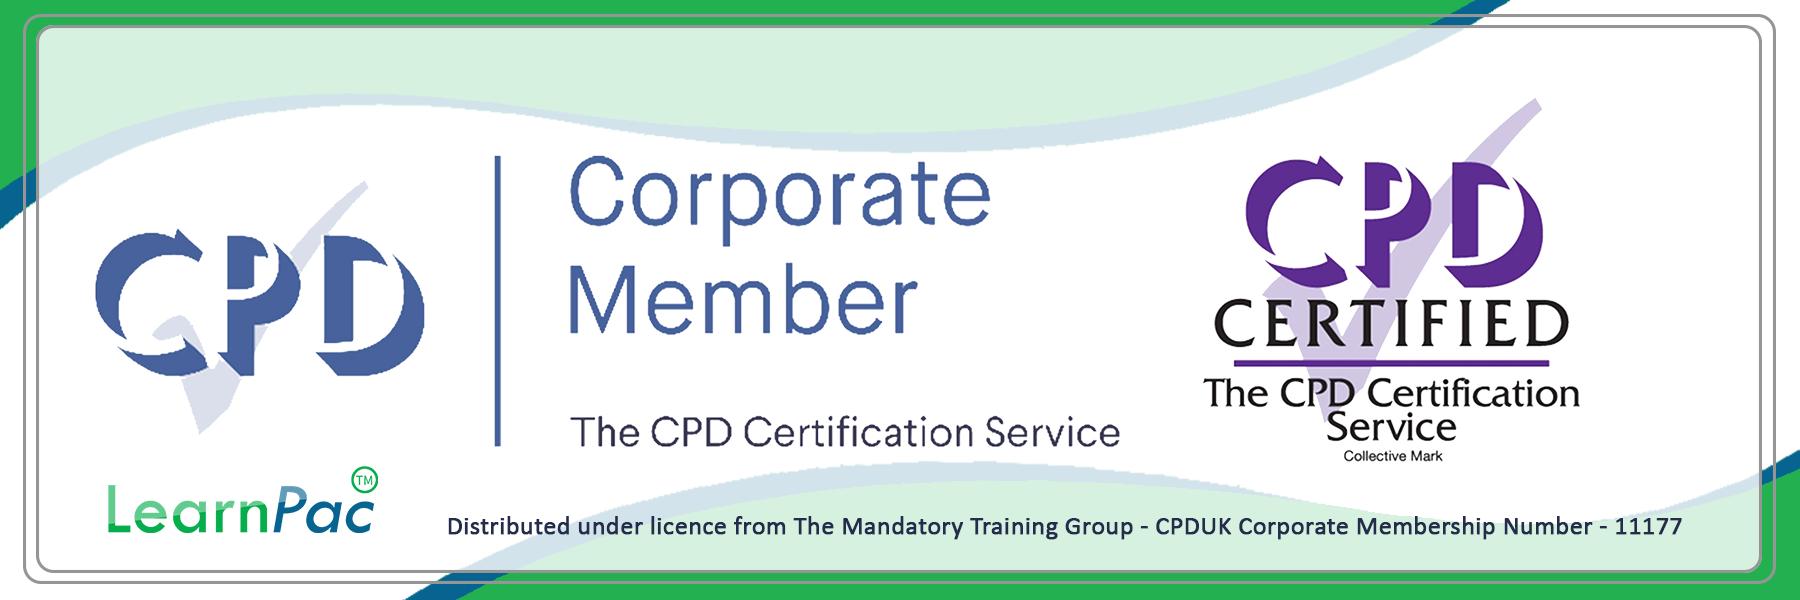 Care Certificate Standard 8 - CPDUK Certified - Learnpac System UK - (2)Care Certificate Standard 8 - CPDUK Certified - Learnpac System UK -